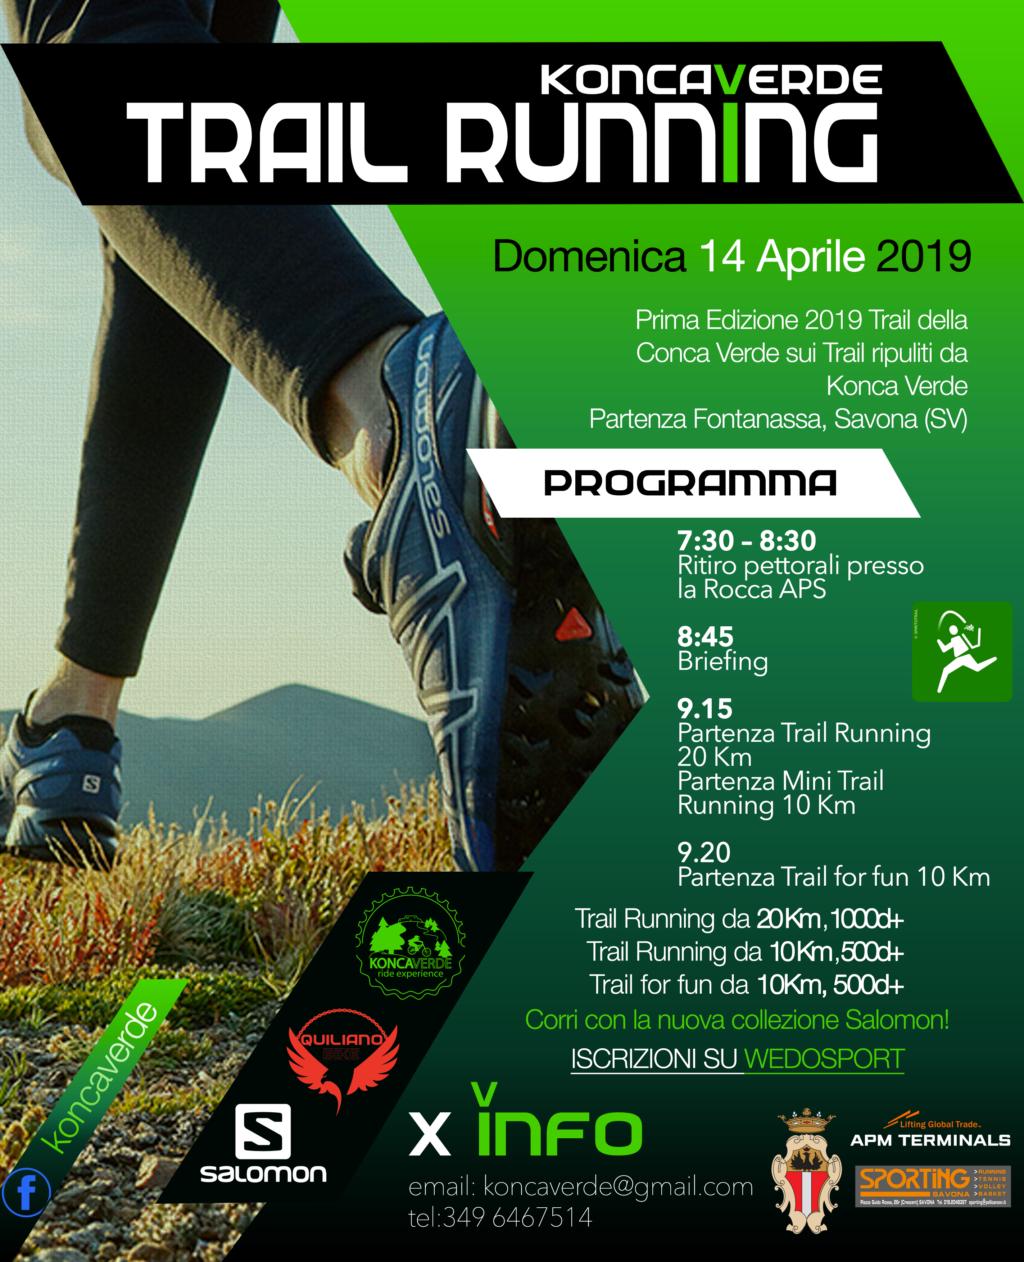 Trail Running Koncaverde 2019 Locandina